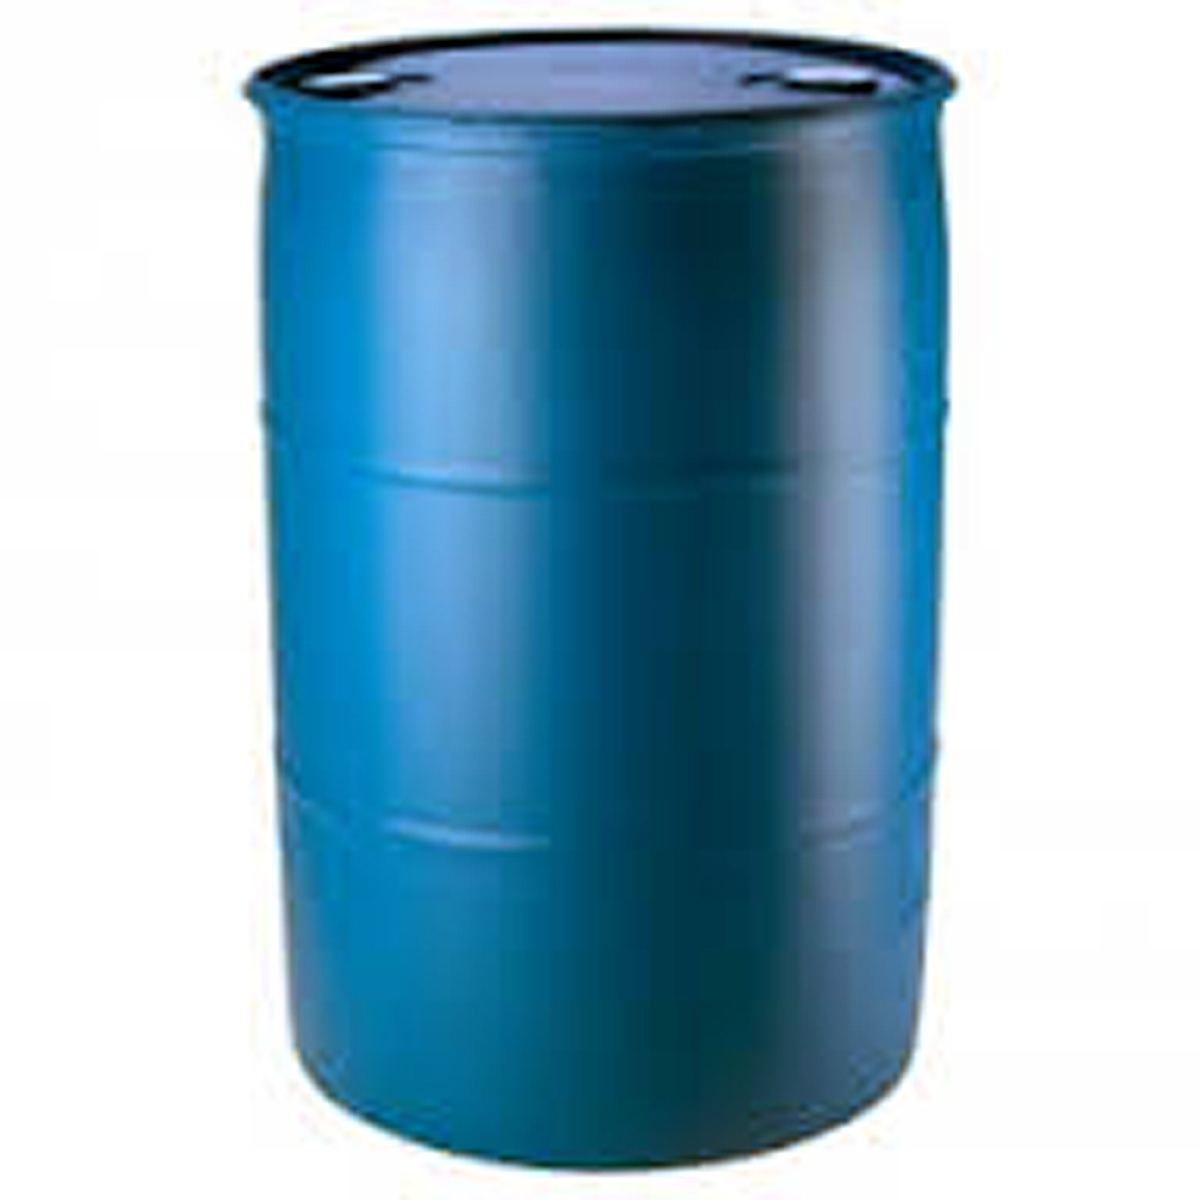 Pretreat Plus Silica 55 Gallon Drum Ro And Nf Antiscalant